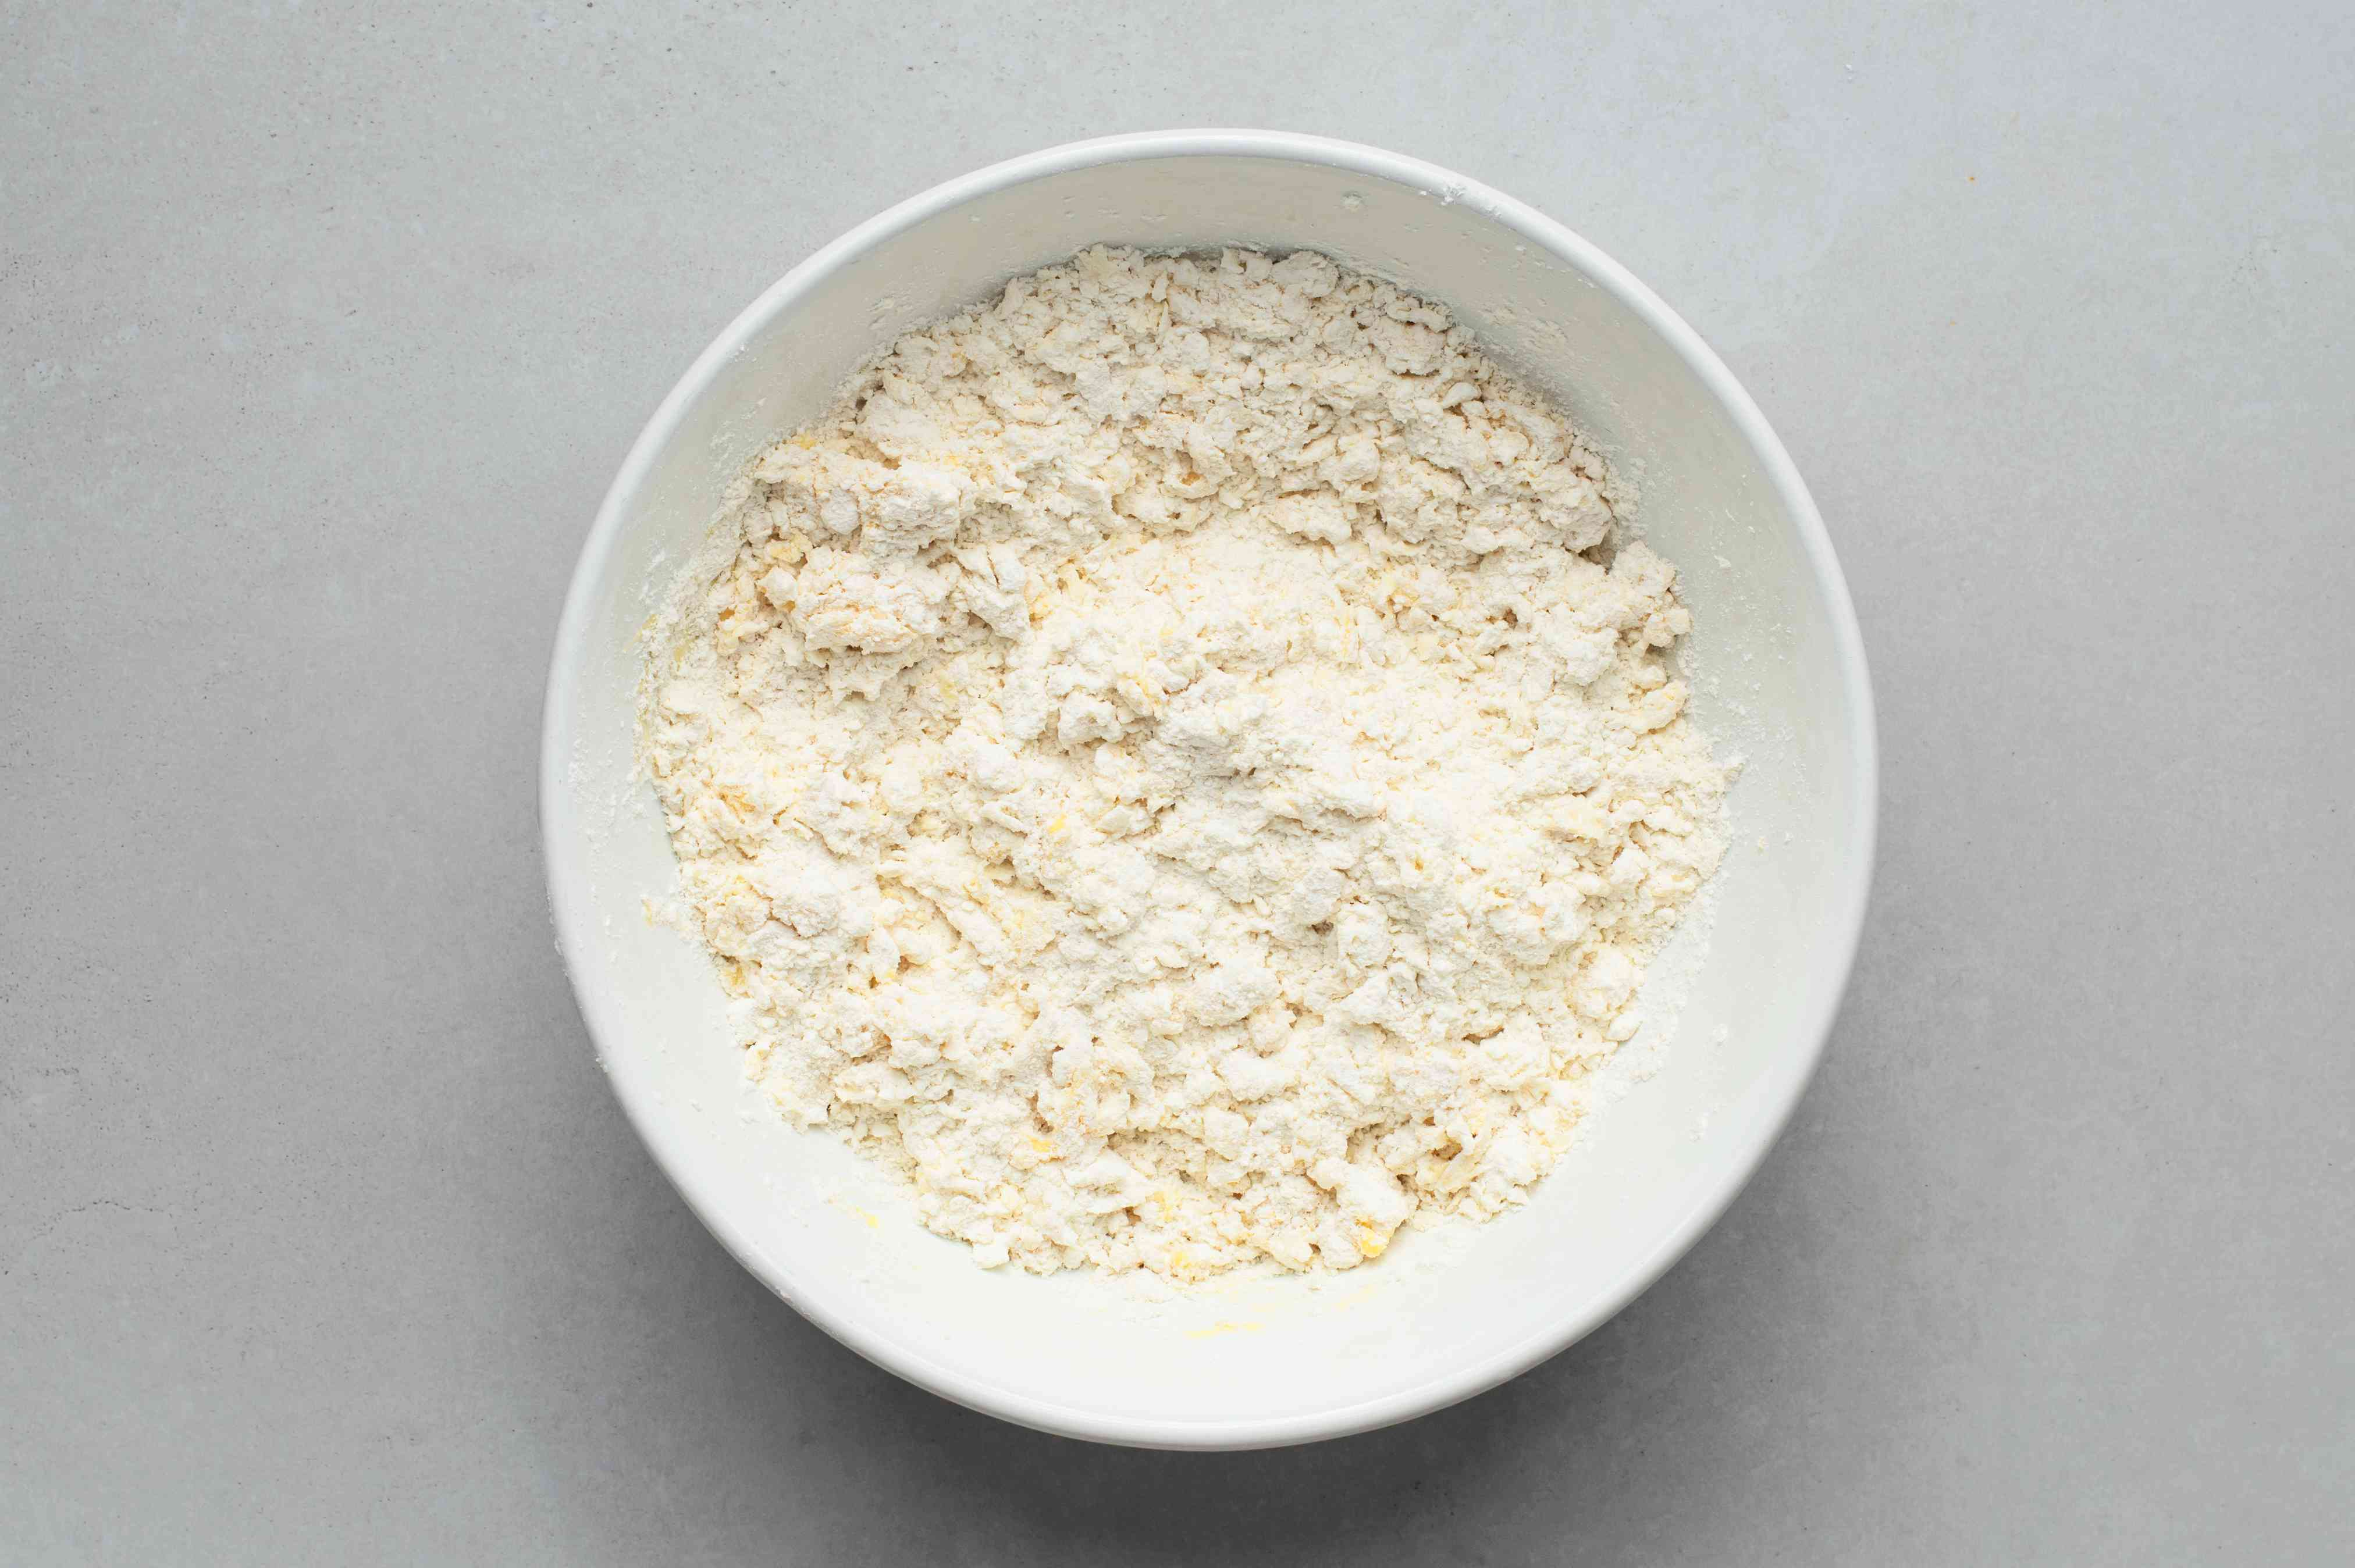 Flour, vegetable shortening, salt, baking powder, vinegar, egg, and vodka in a bowl